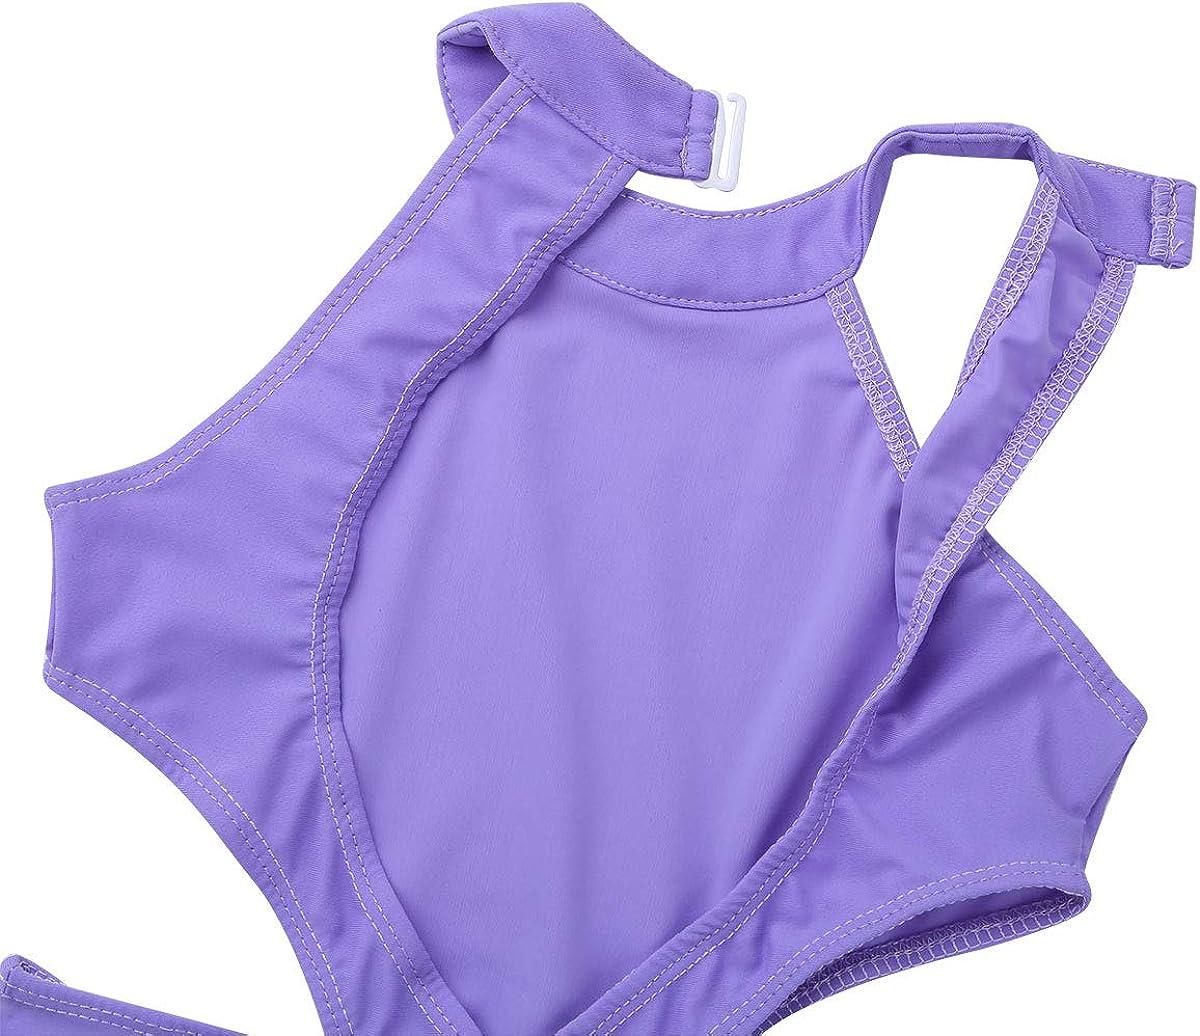 renvena Kids Girls Ballet Dance Gymnastic Active Leotard Sleeveless Halter Cutouts on Waist Backless Unitard Bodysuit